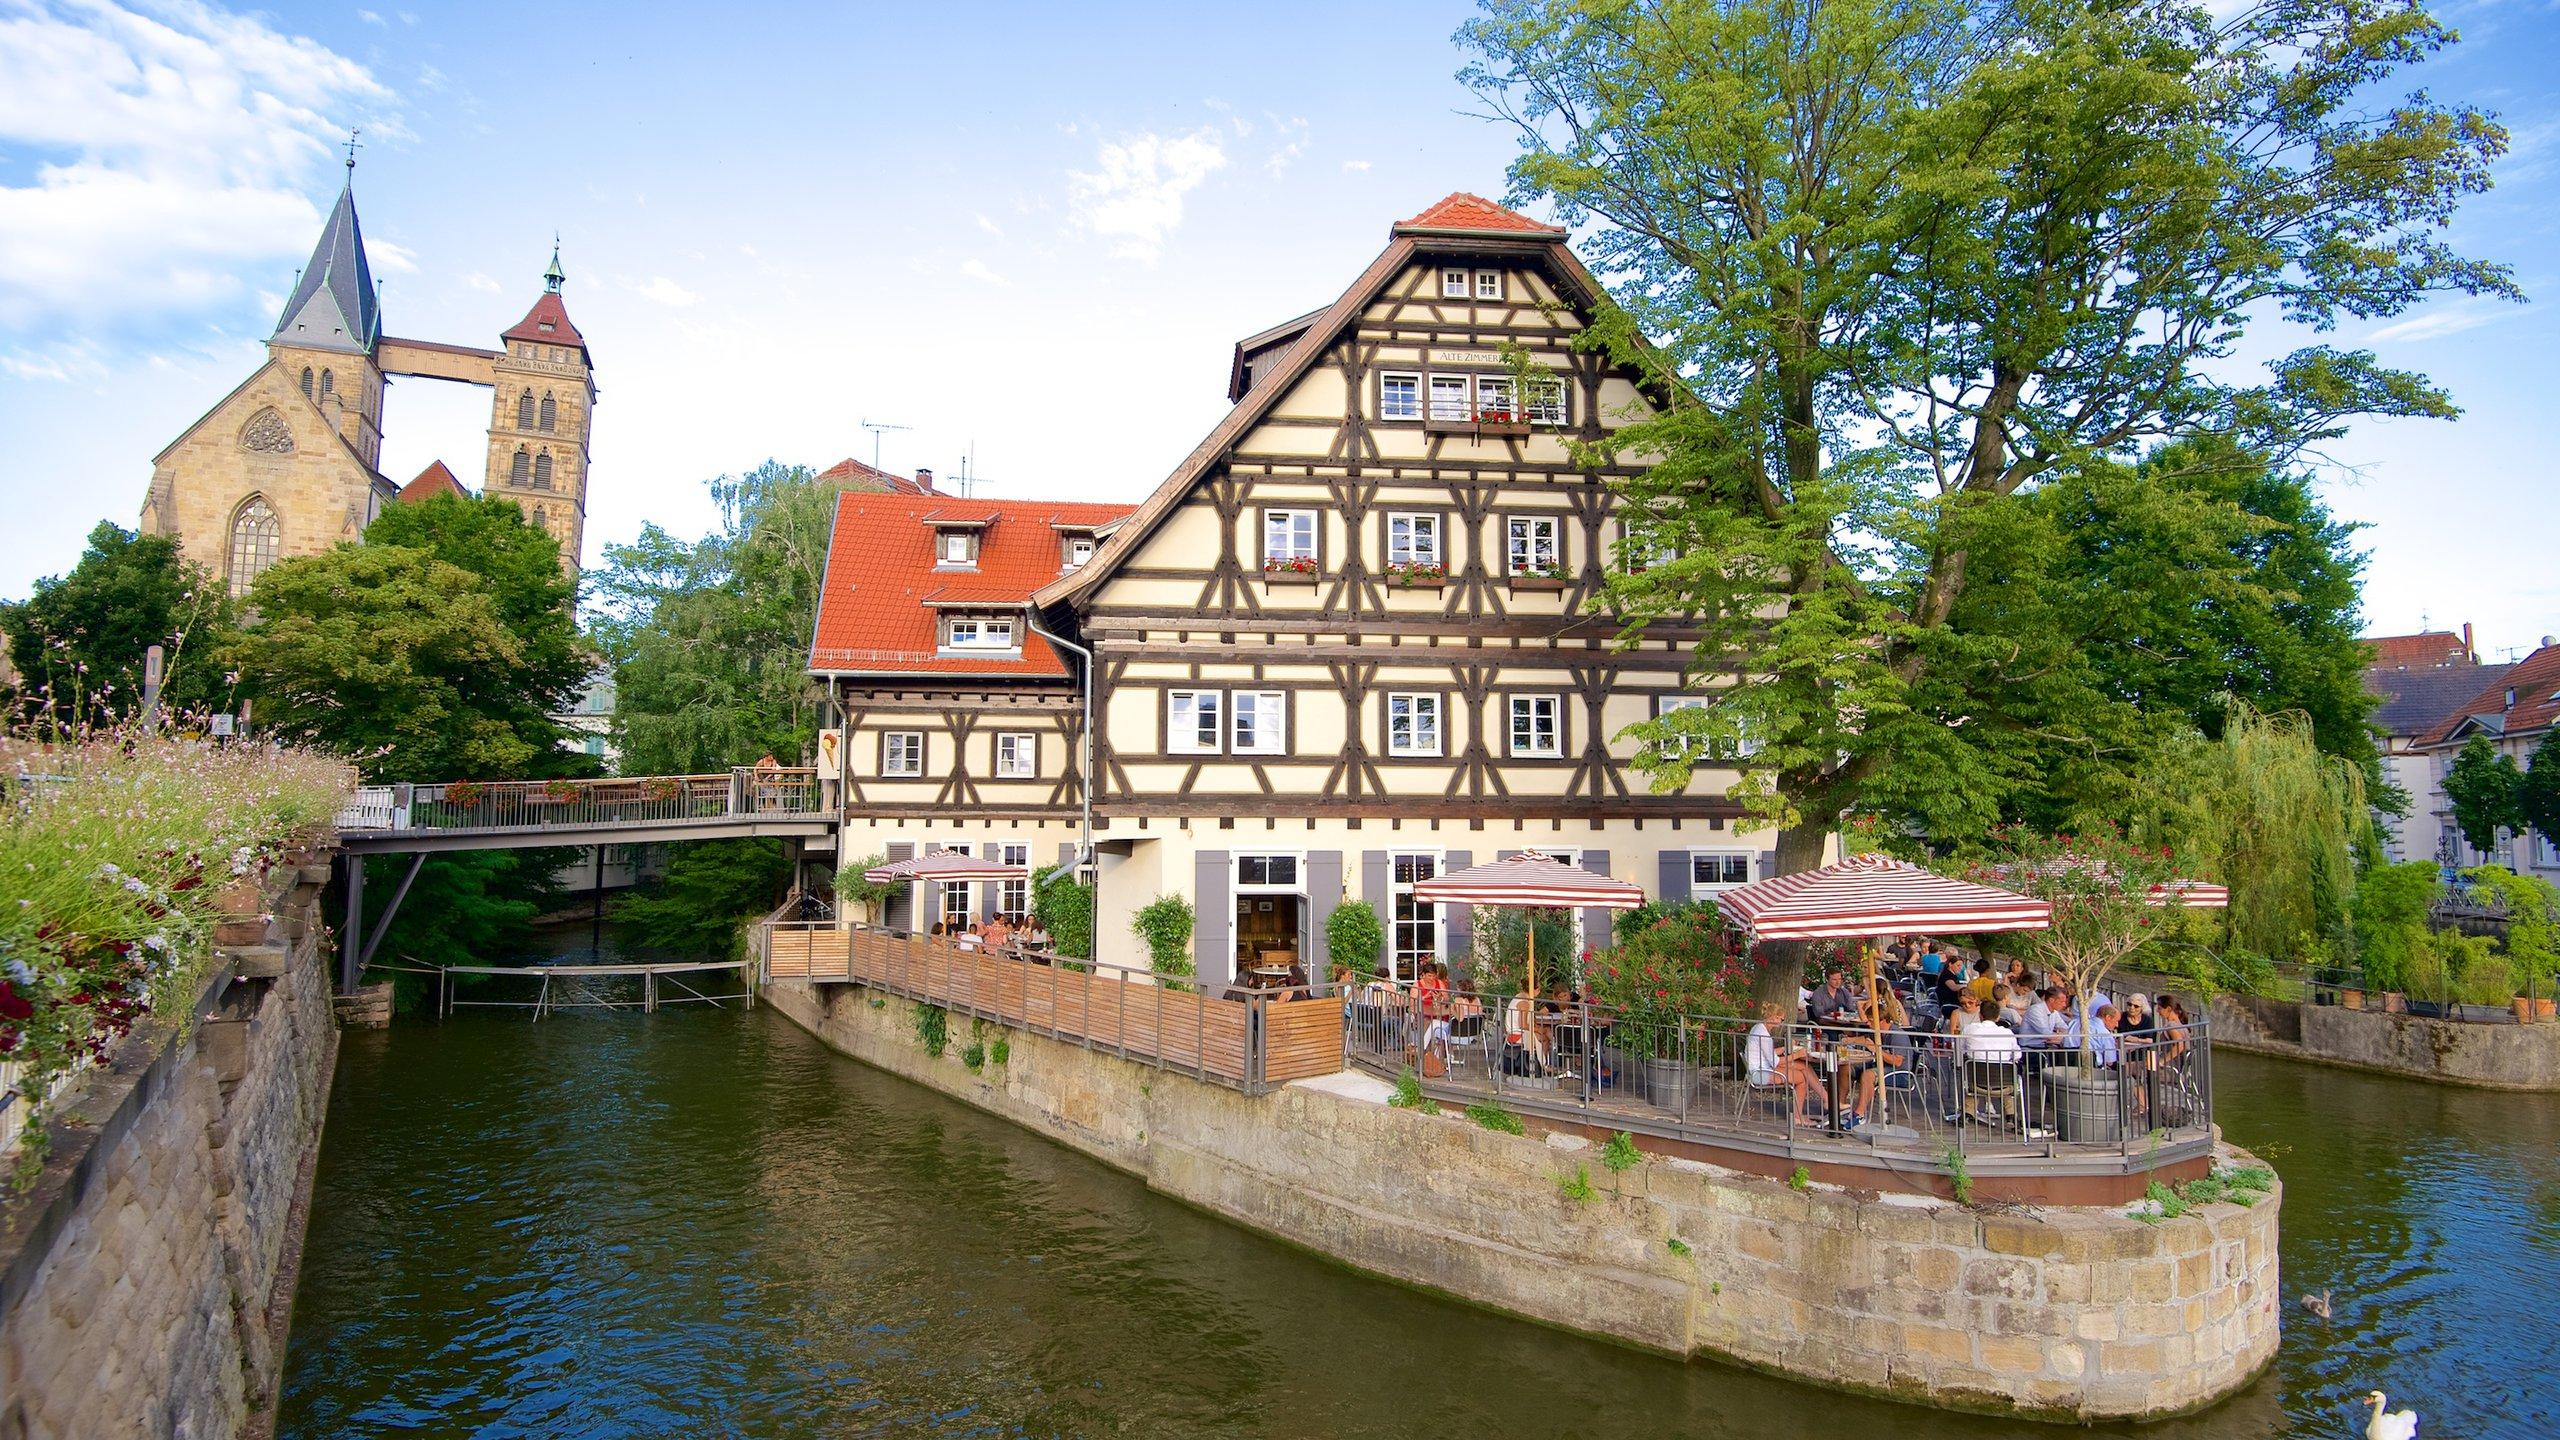 Hotel Stuttgart Gunstig Buchen Hotels Expedia De